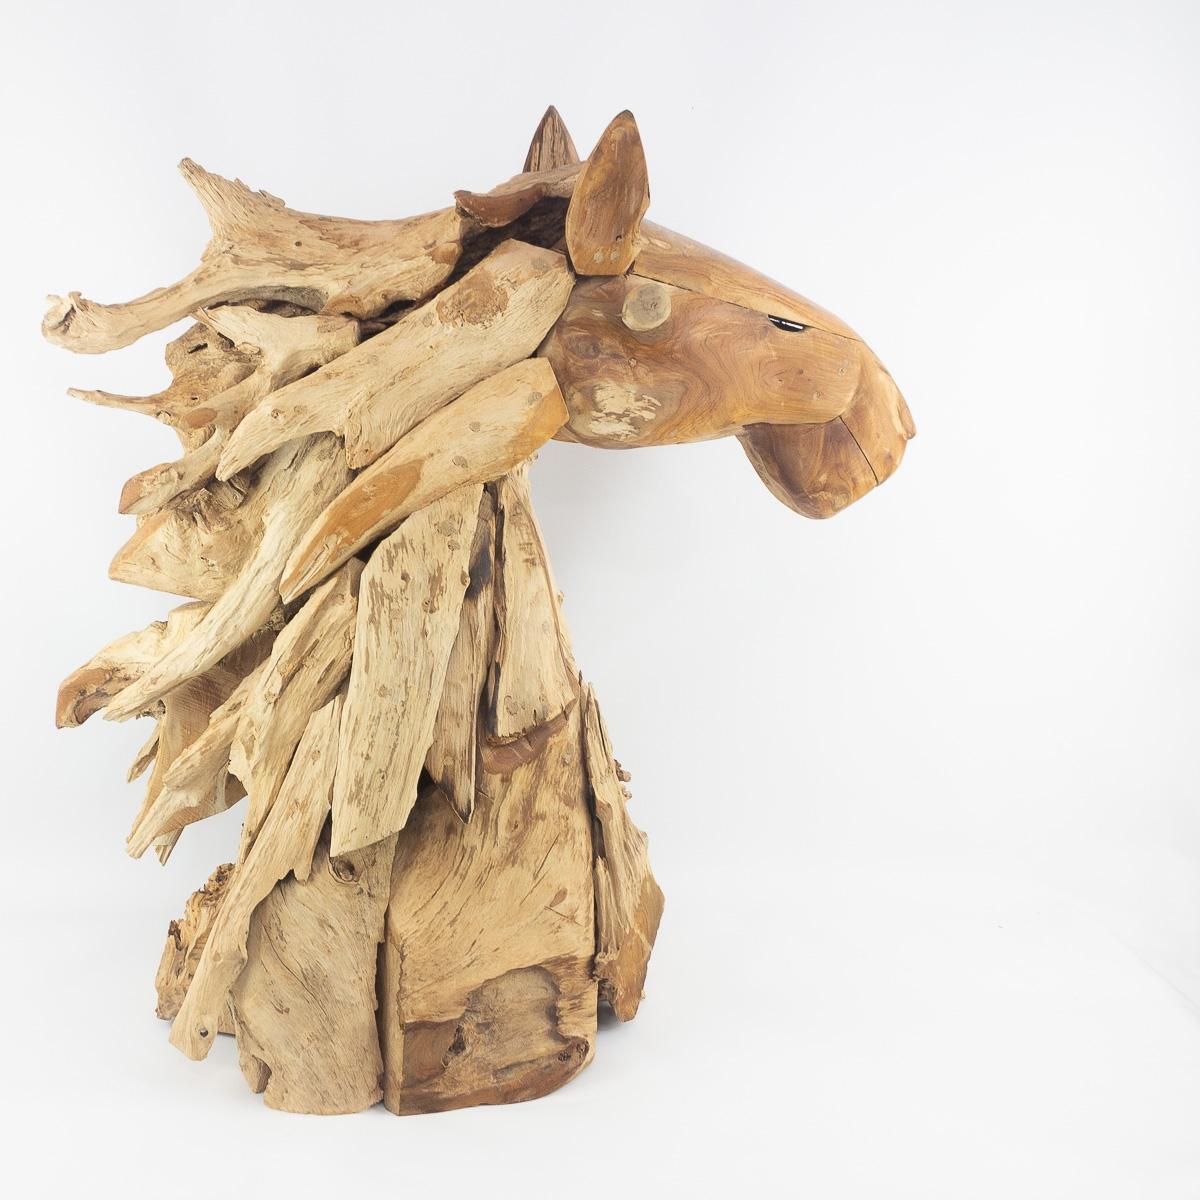 Cabeza decorativa de caballo realizada con raçices de teca | mirocco.com